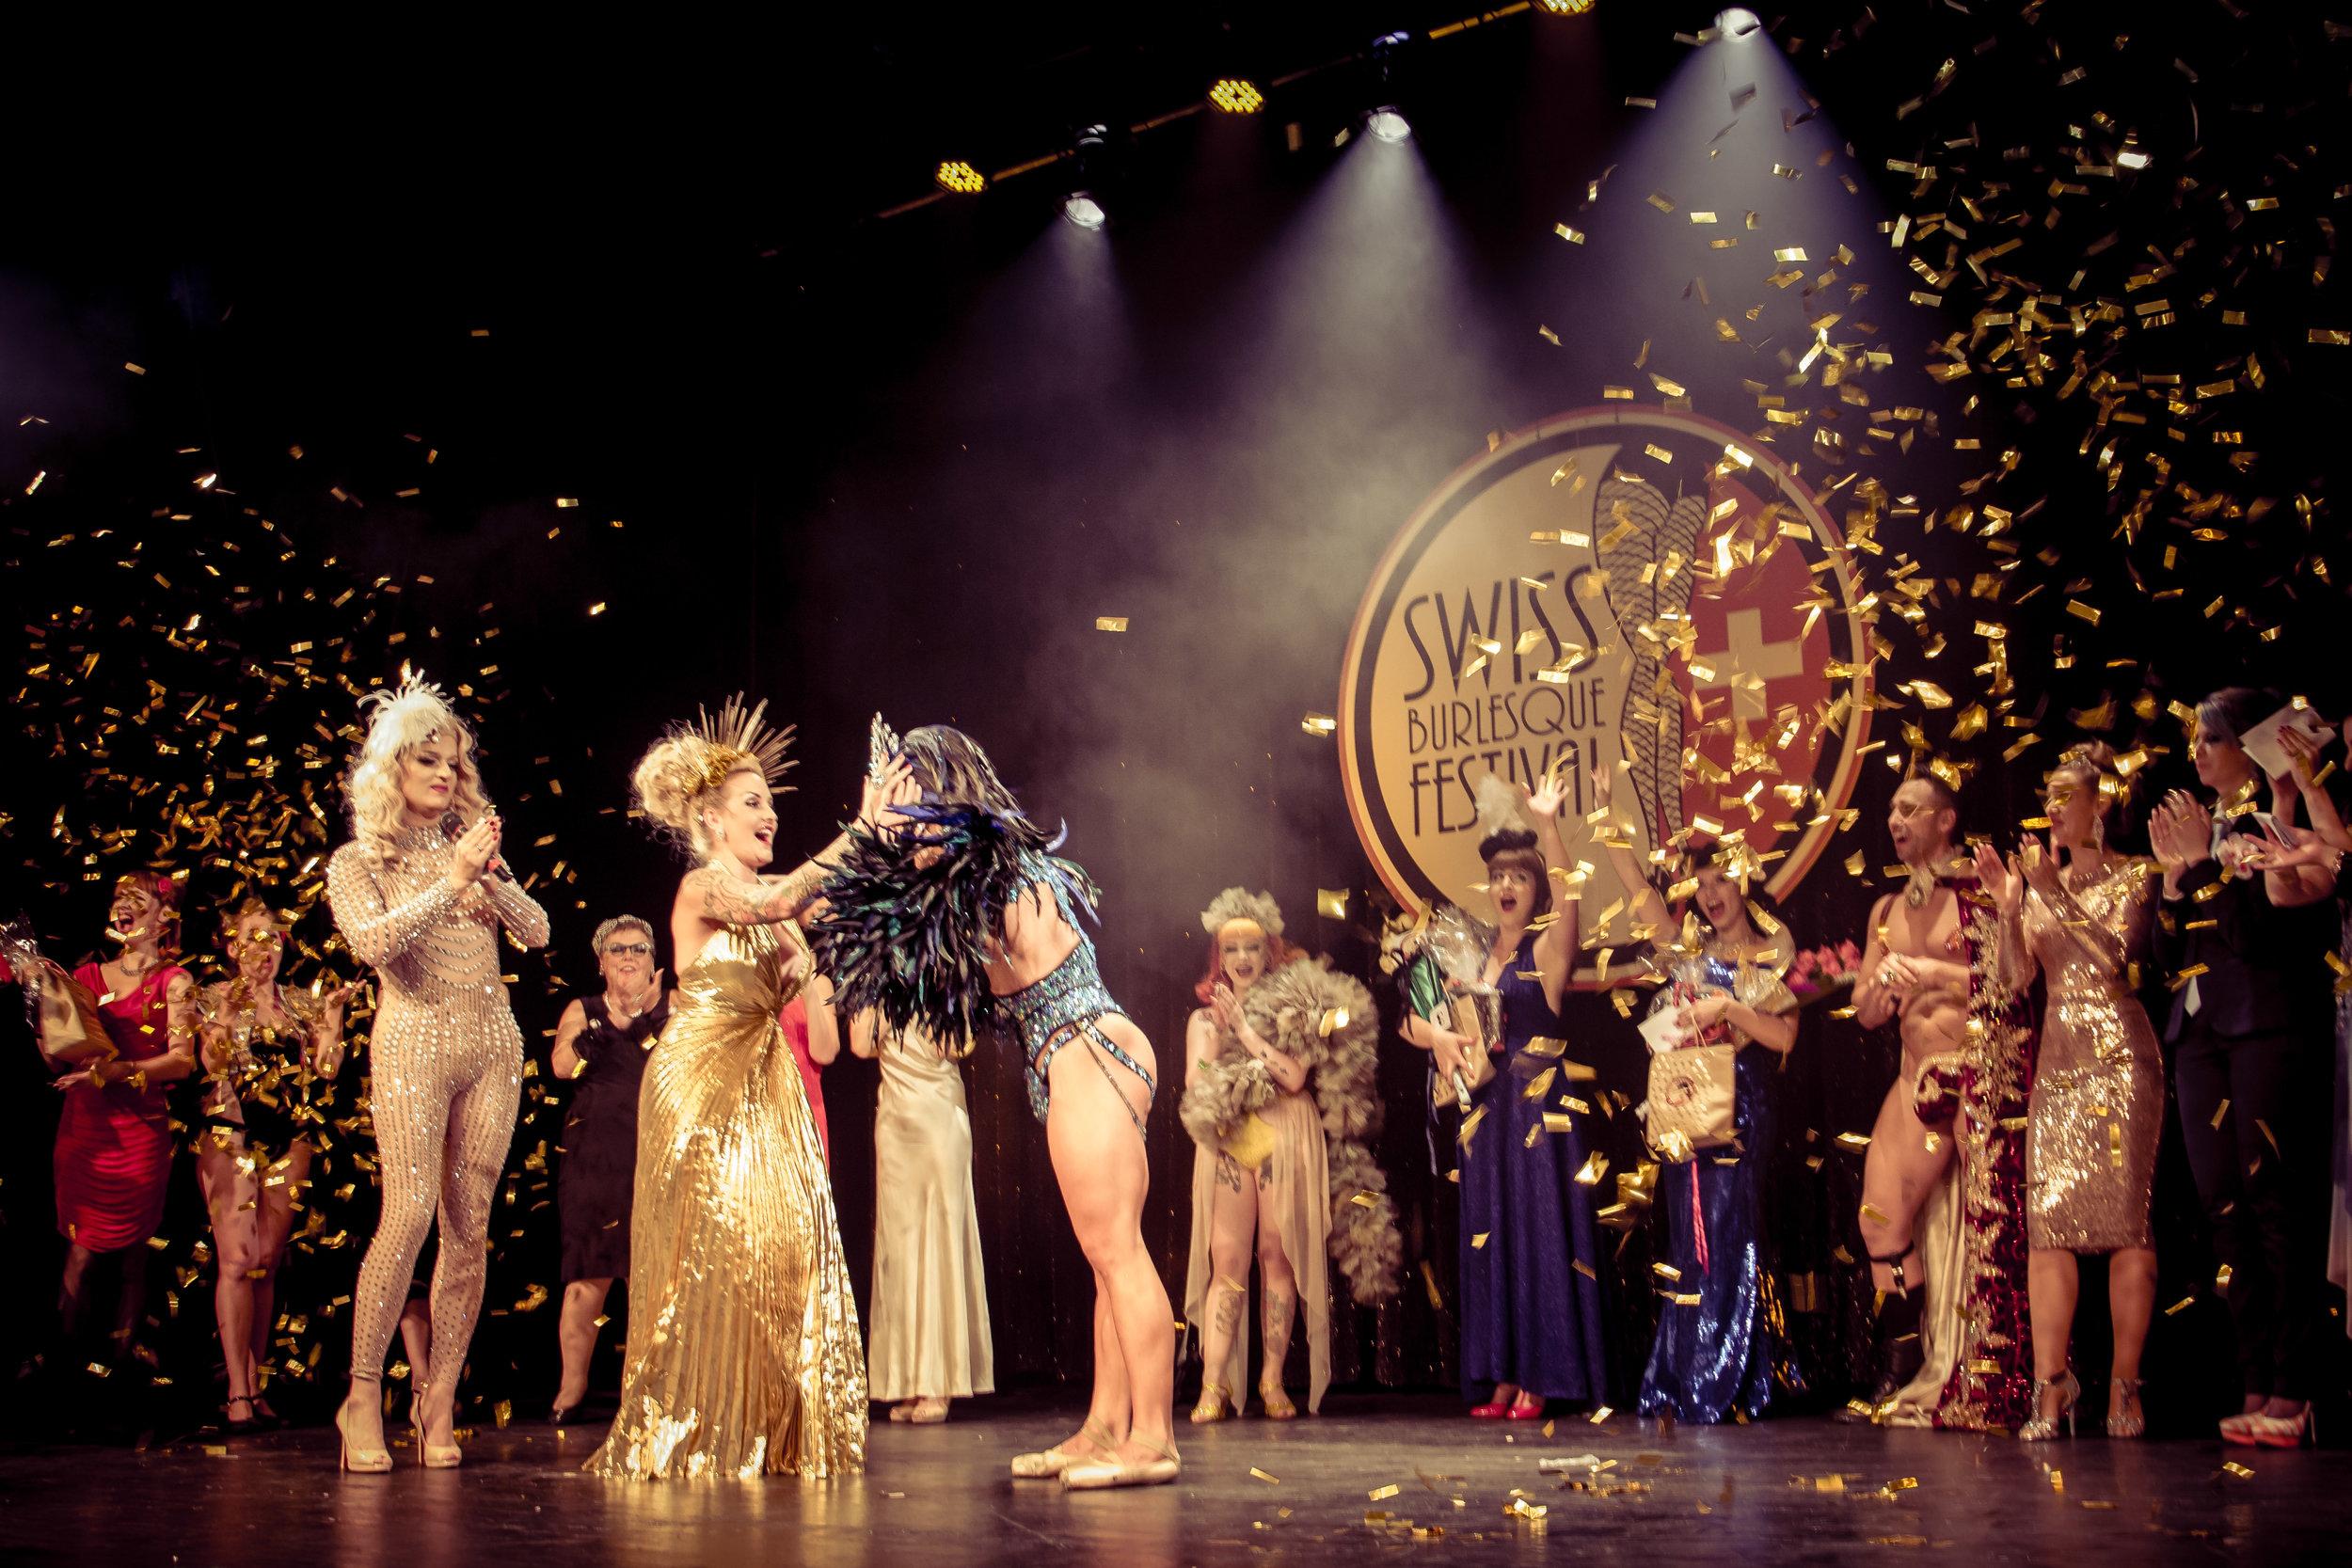 Swiss Burlesque Festival 2018 by Dirk Behlau-4215.jpg